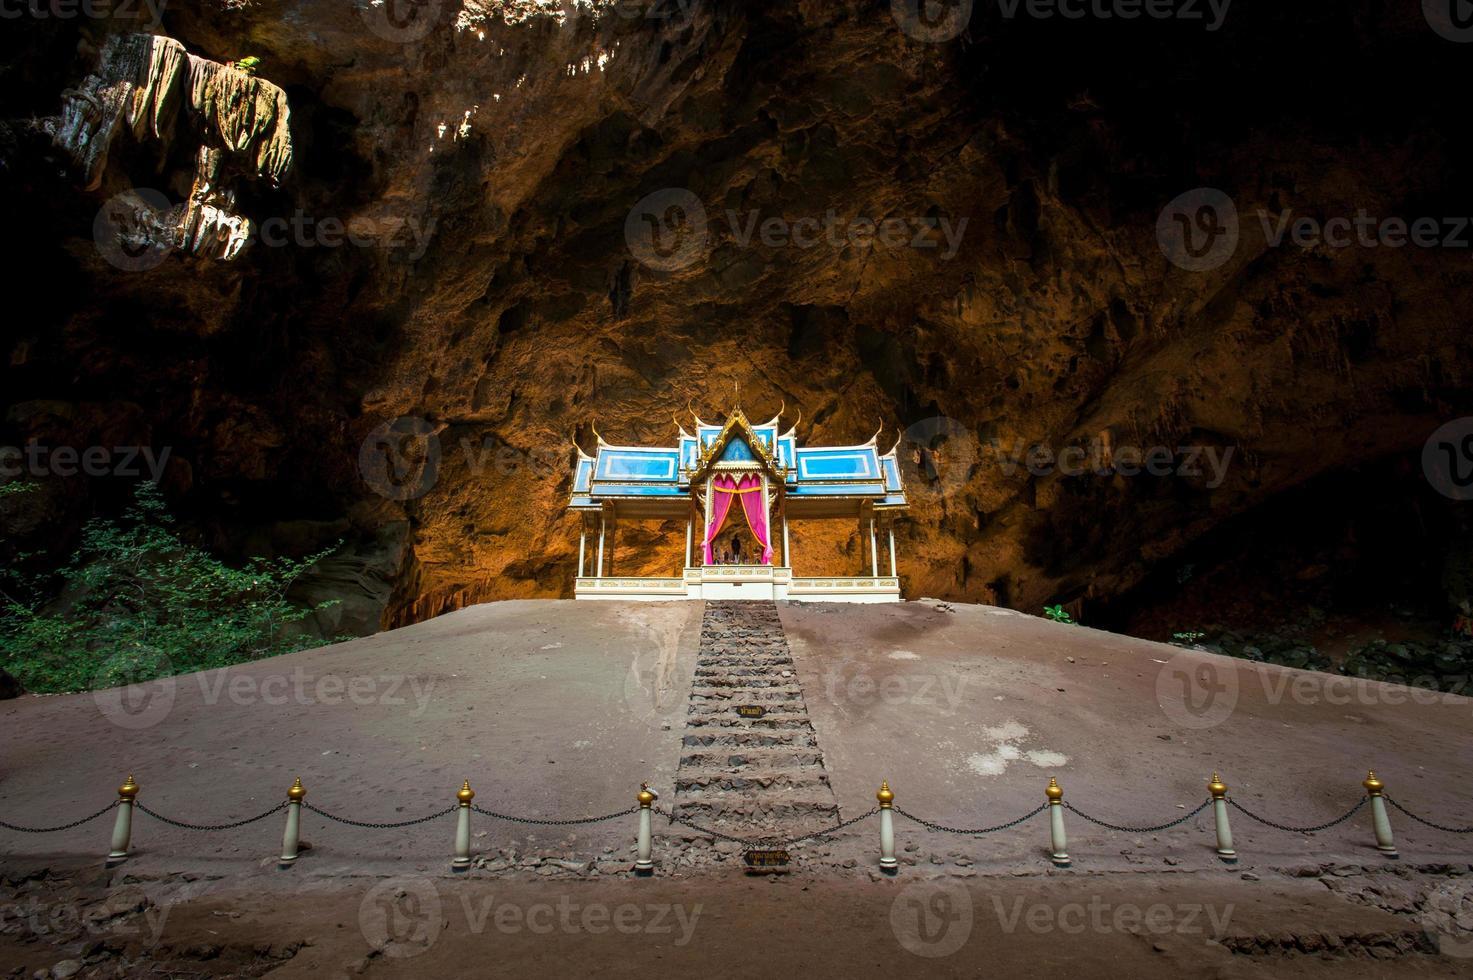 Royal pavilion in the Phraya Nakhon Cave photo